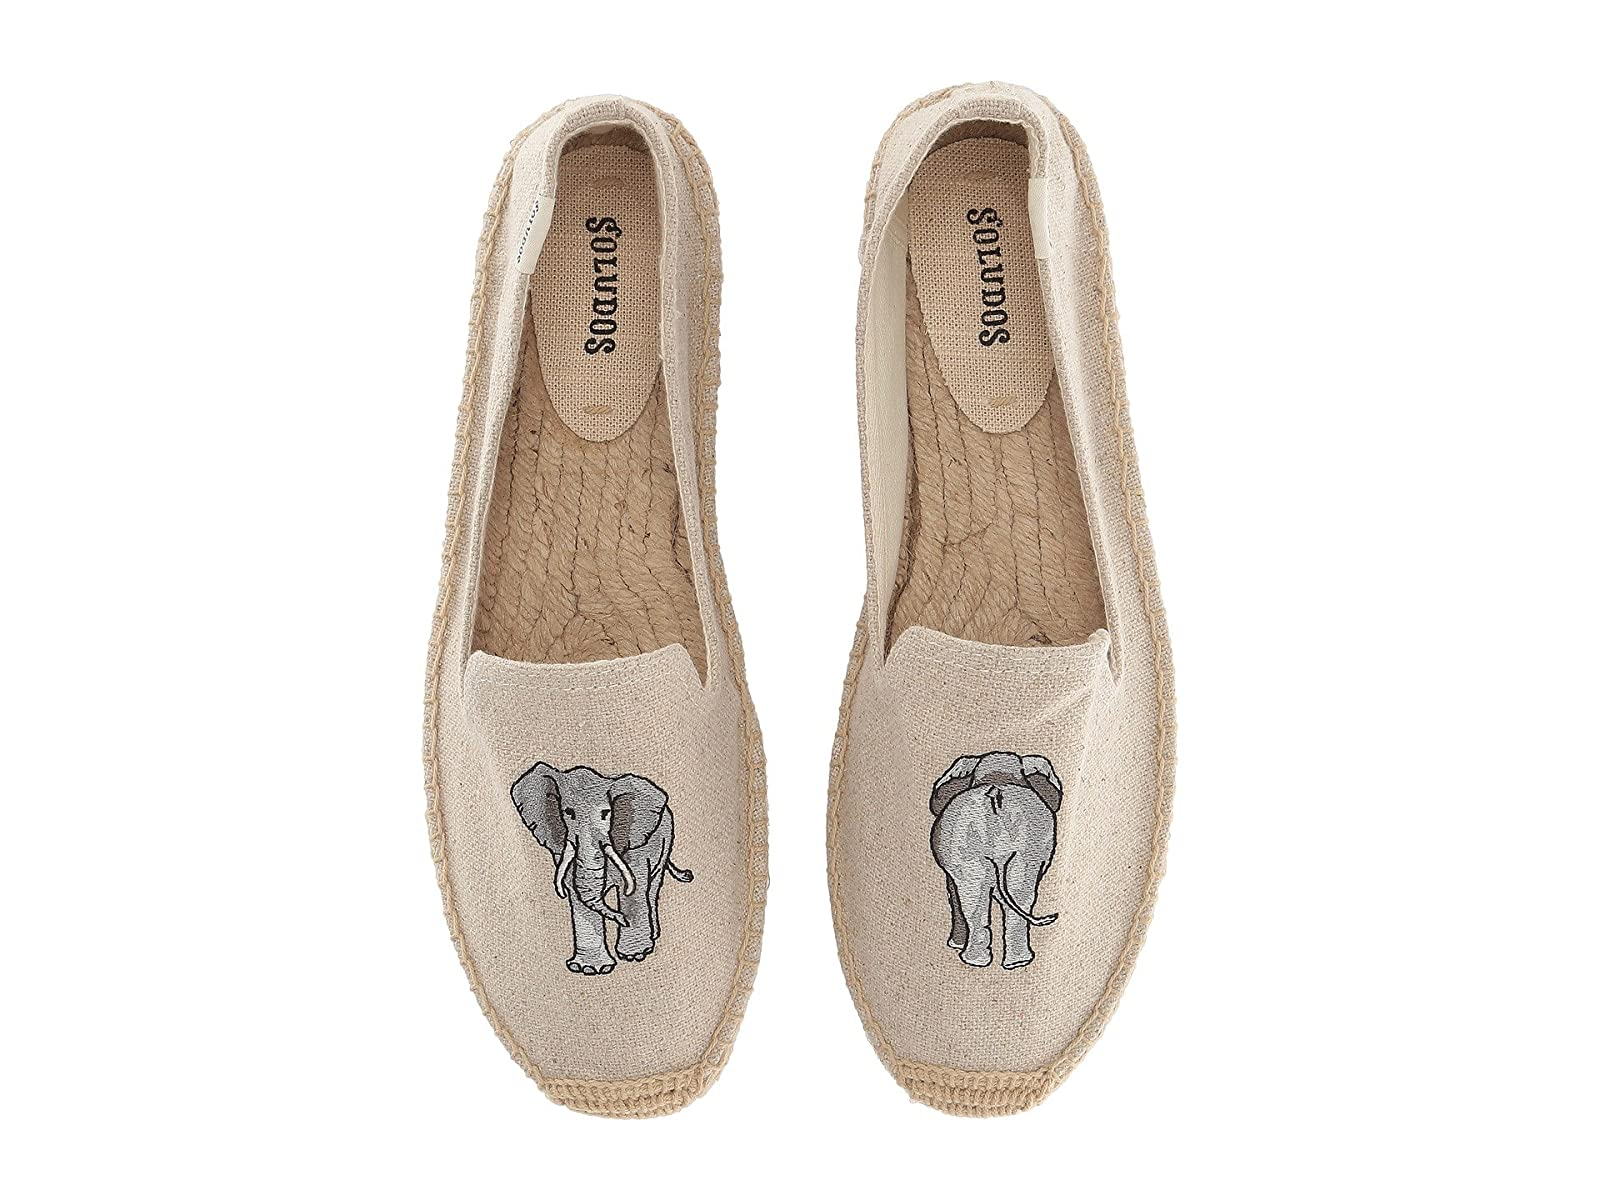 Soludos Elephant Smoking SlipperCheap and distinctive eye-catching shoes